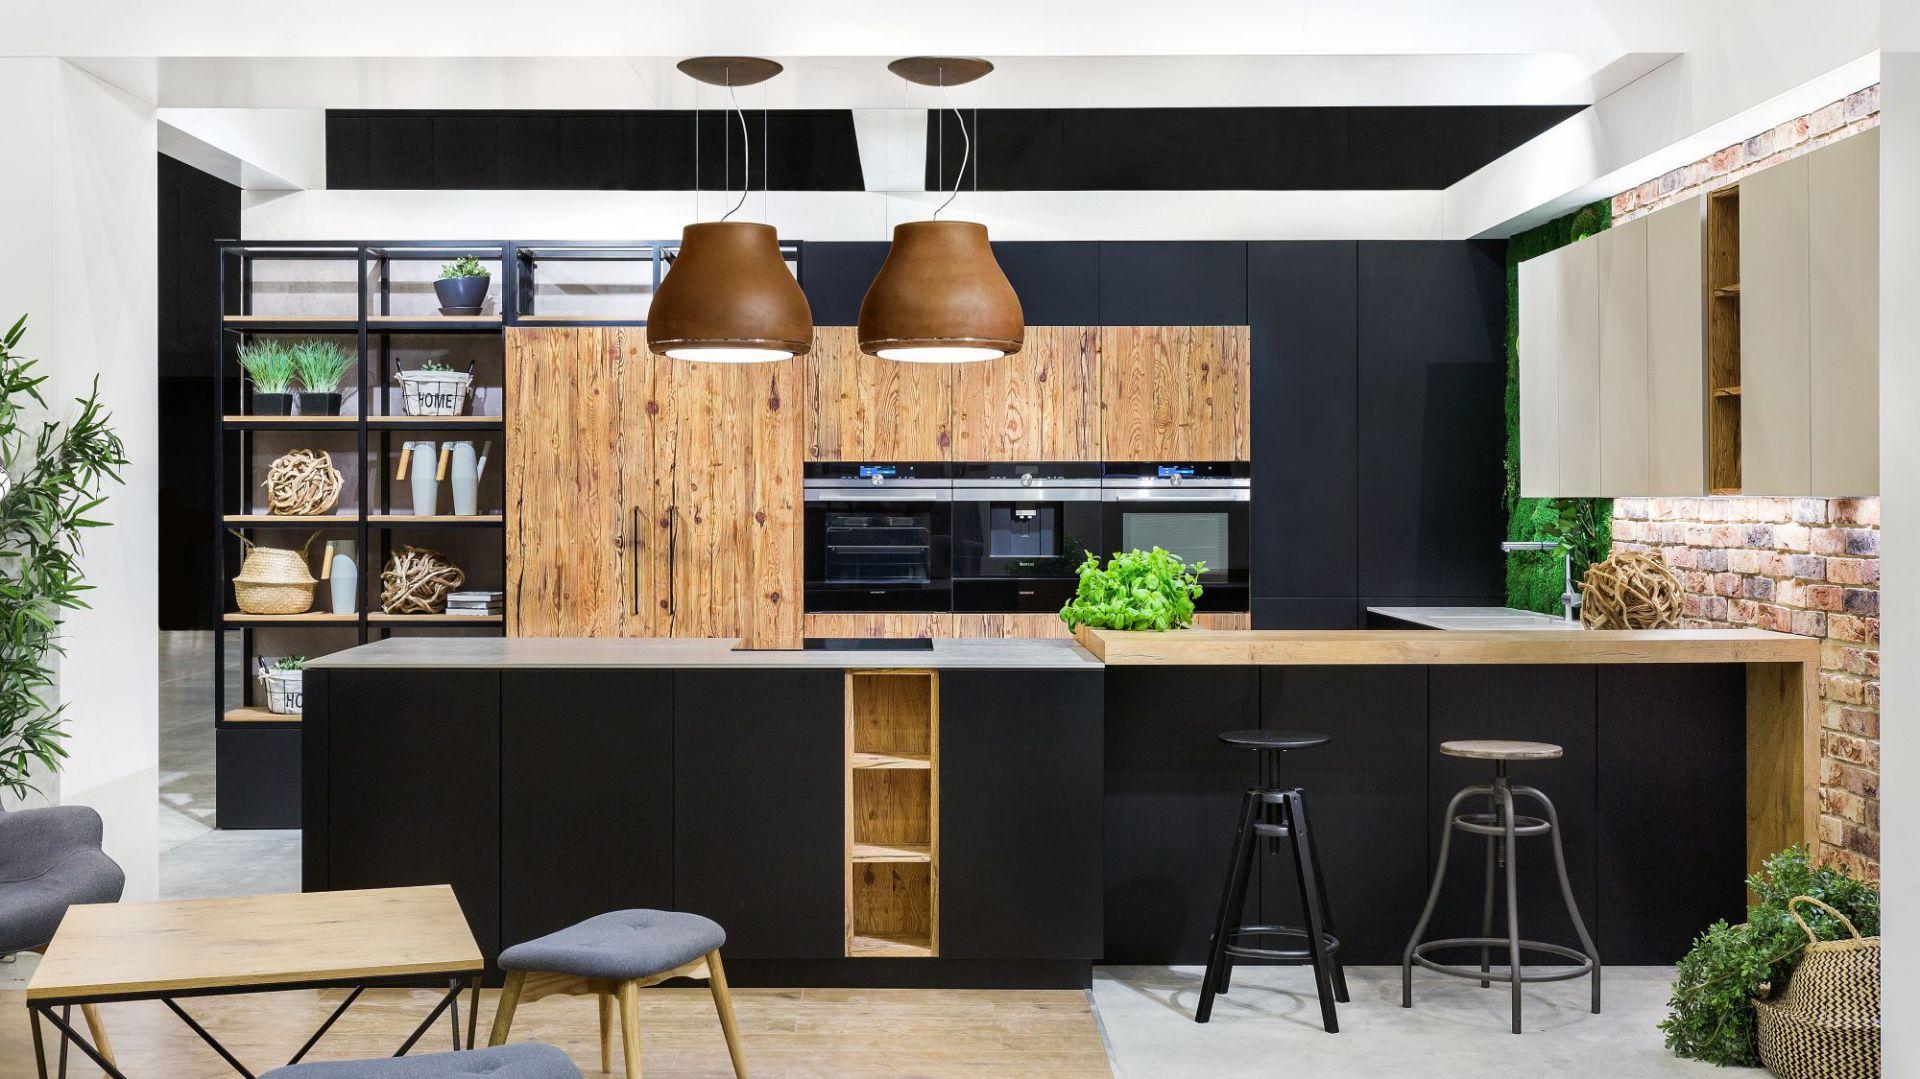 Ekologia w nowoczesnej kuchni. Fot. Studio Max Kuchnie